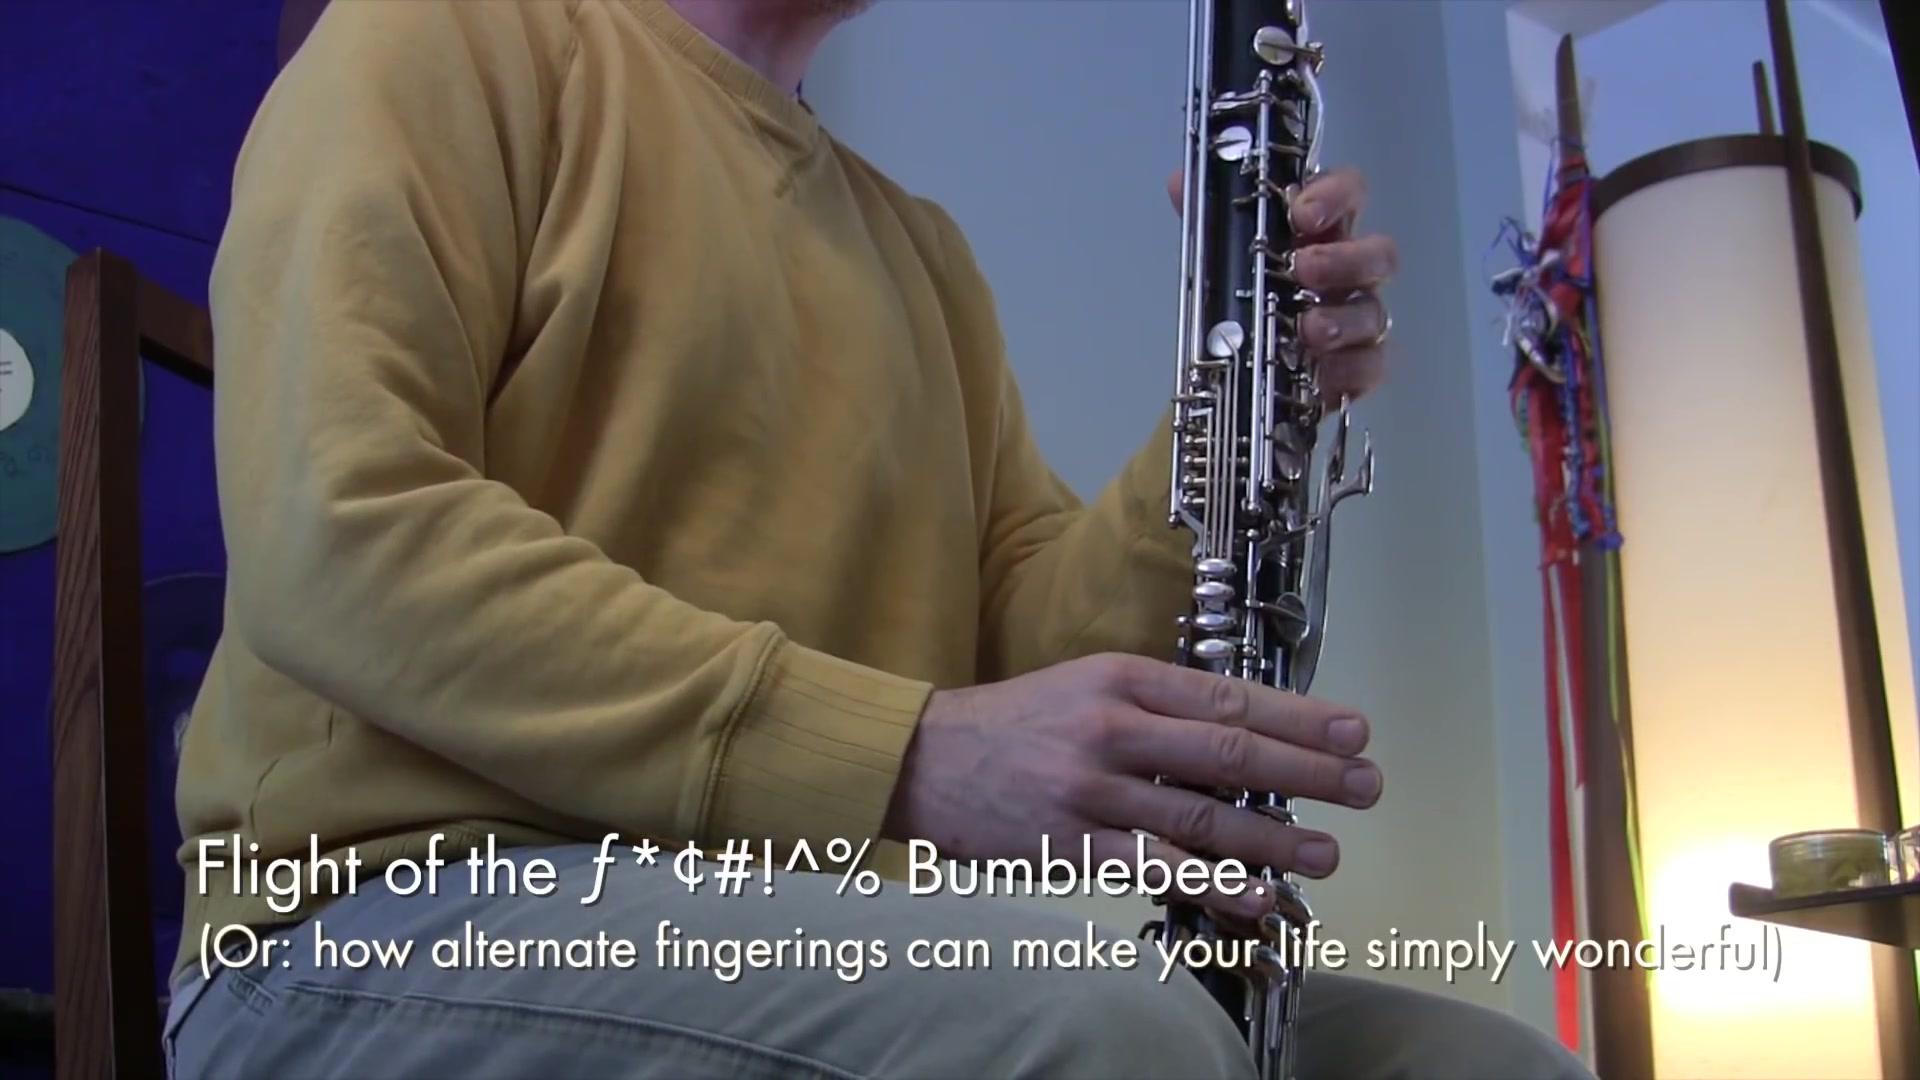 【低音單簧管】低音黑管也能吹野蜂飛舞?!!_嗶哩嗶哩 (゜-゜)つロ 干杯~-bilibili